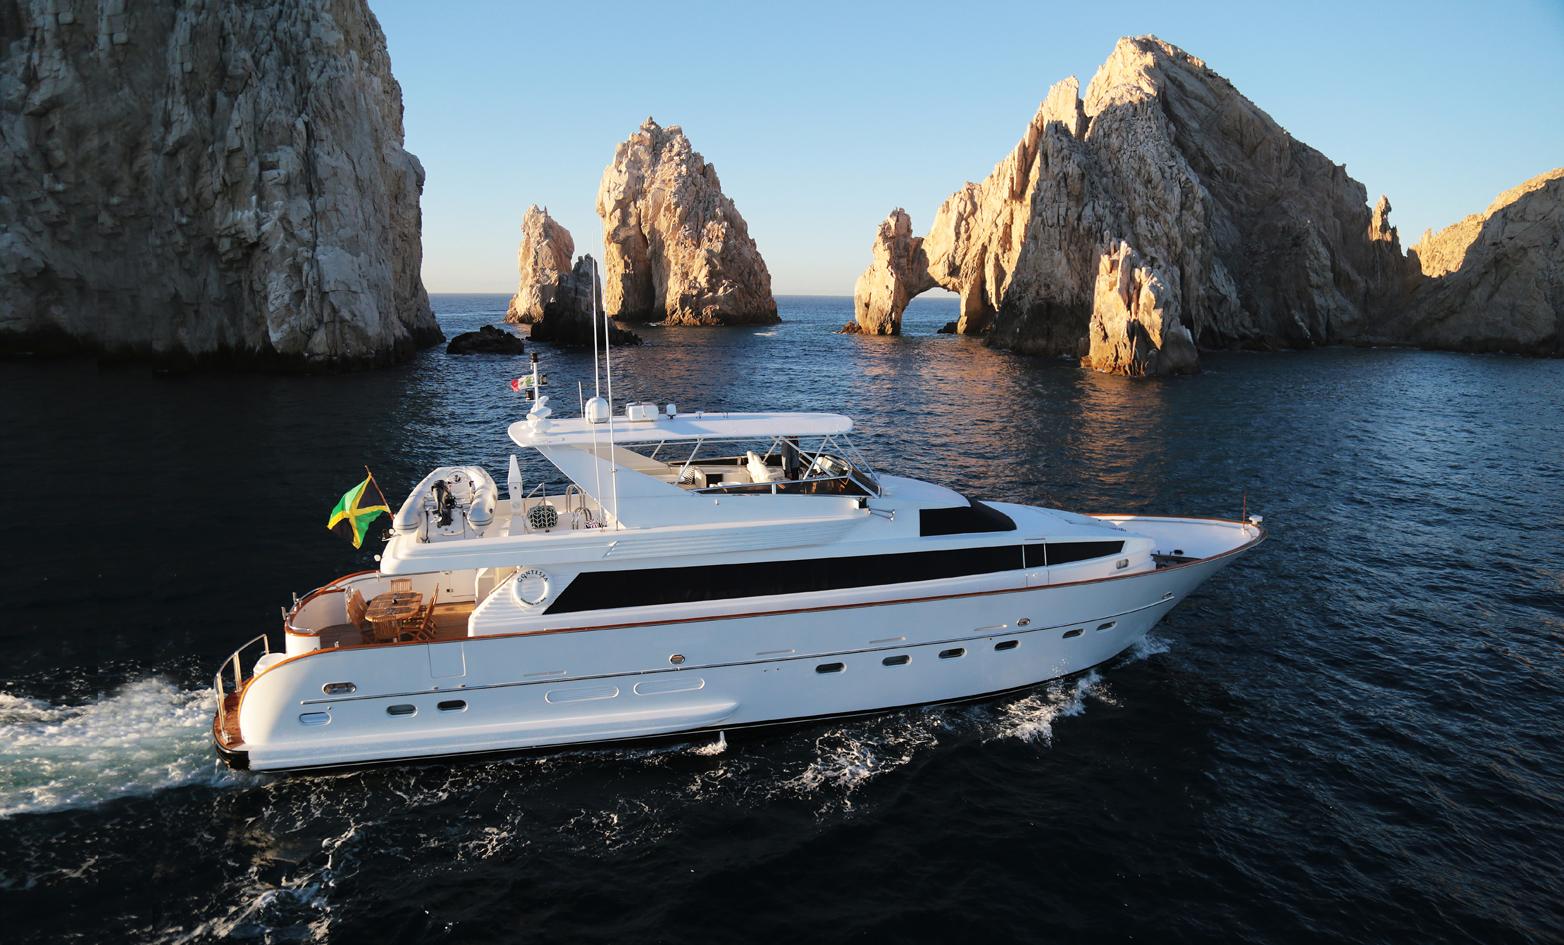 Yacht- The Contessa